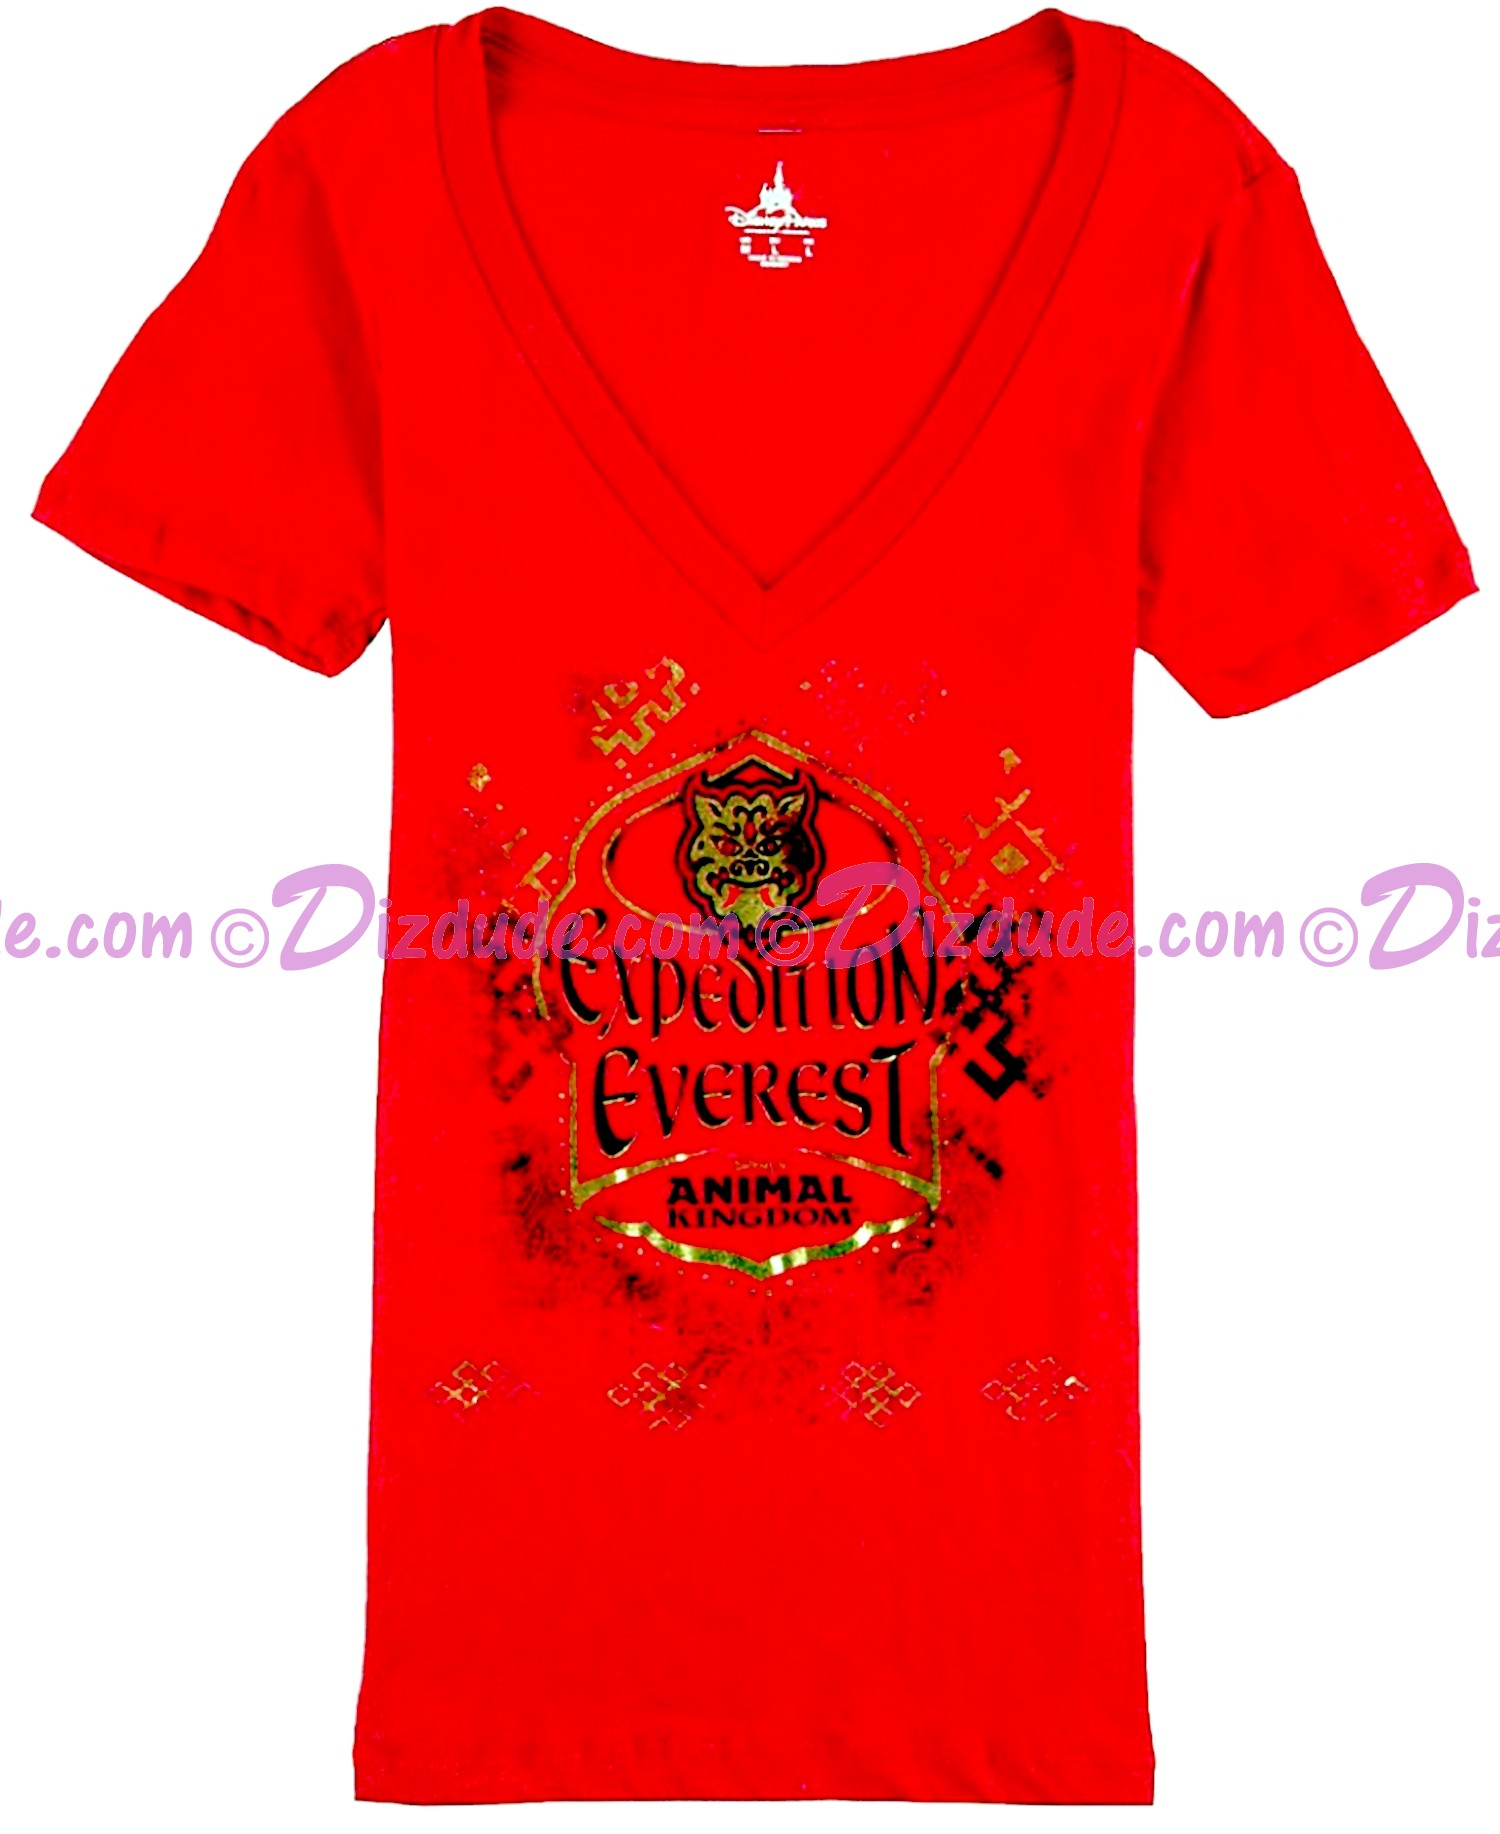 Expedition Everest V-Neck Red Adult T-Shirt (Tee, Tshirt or T shirt) ~ Disney Animal Kingdoms